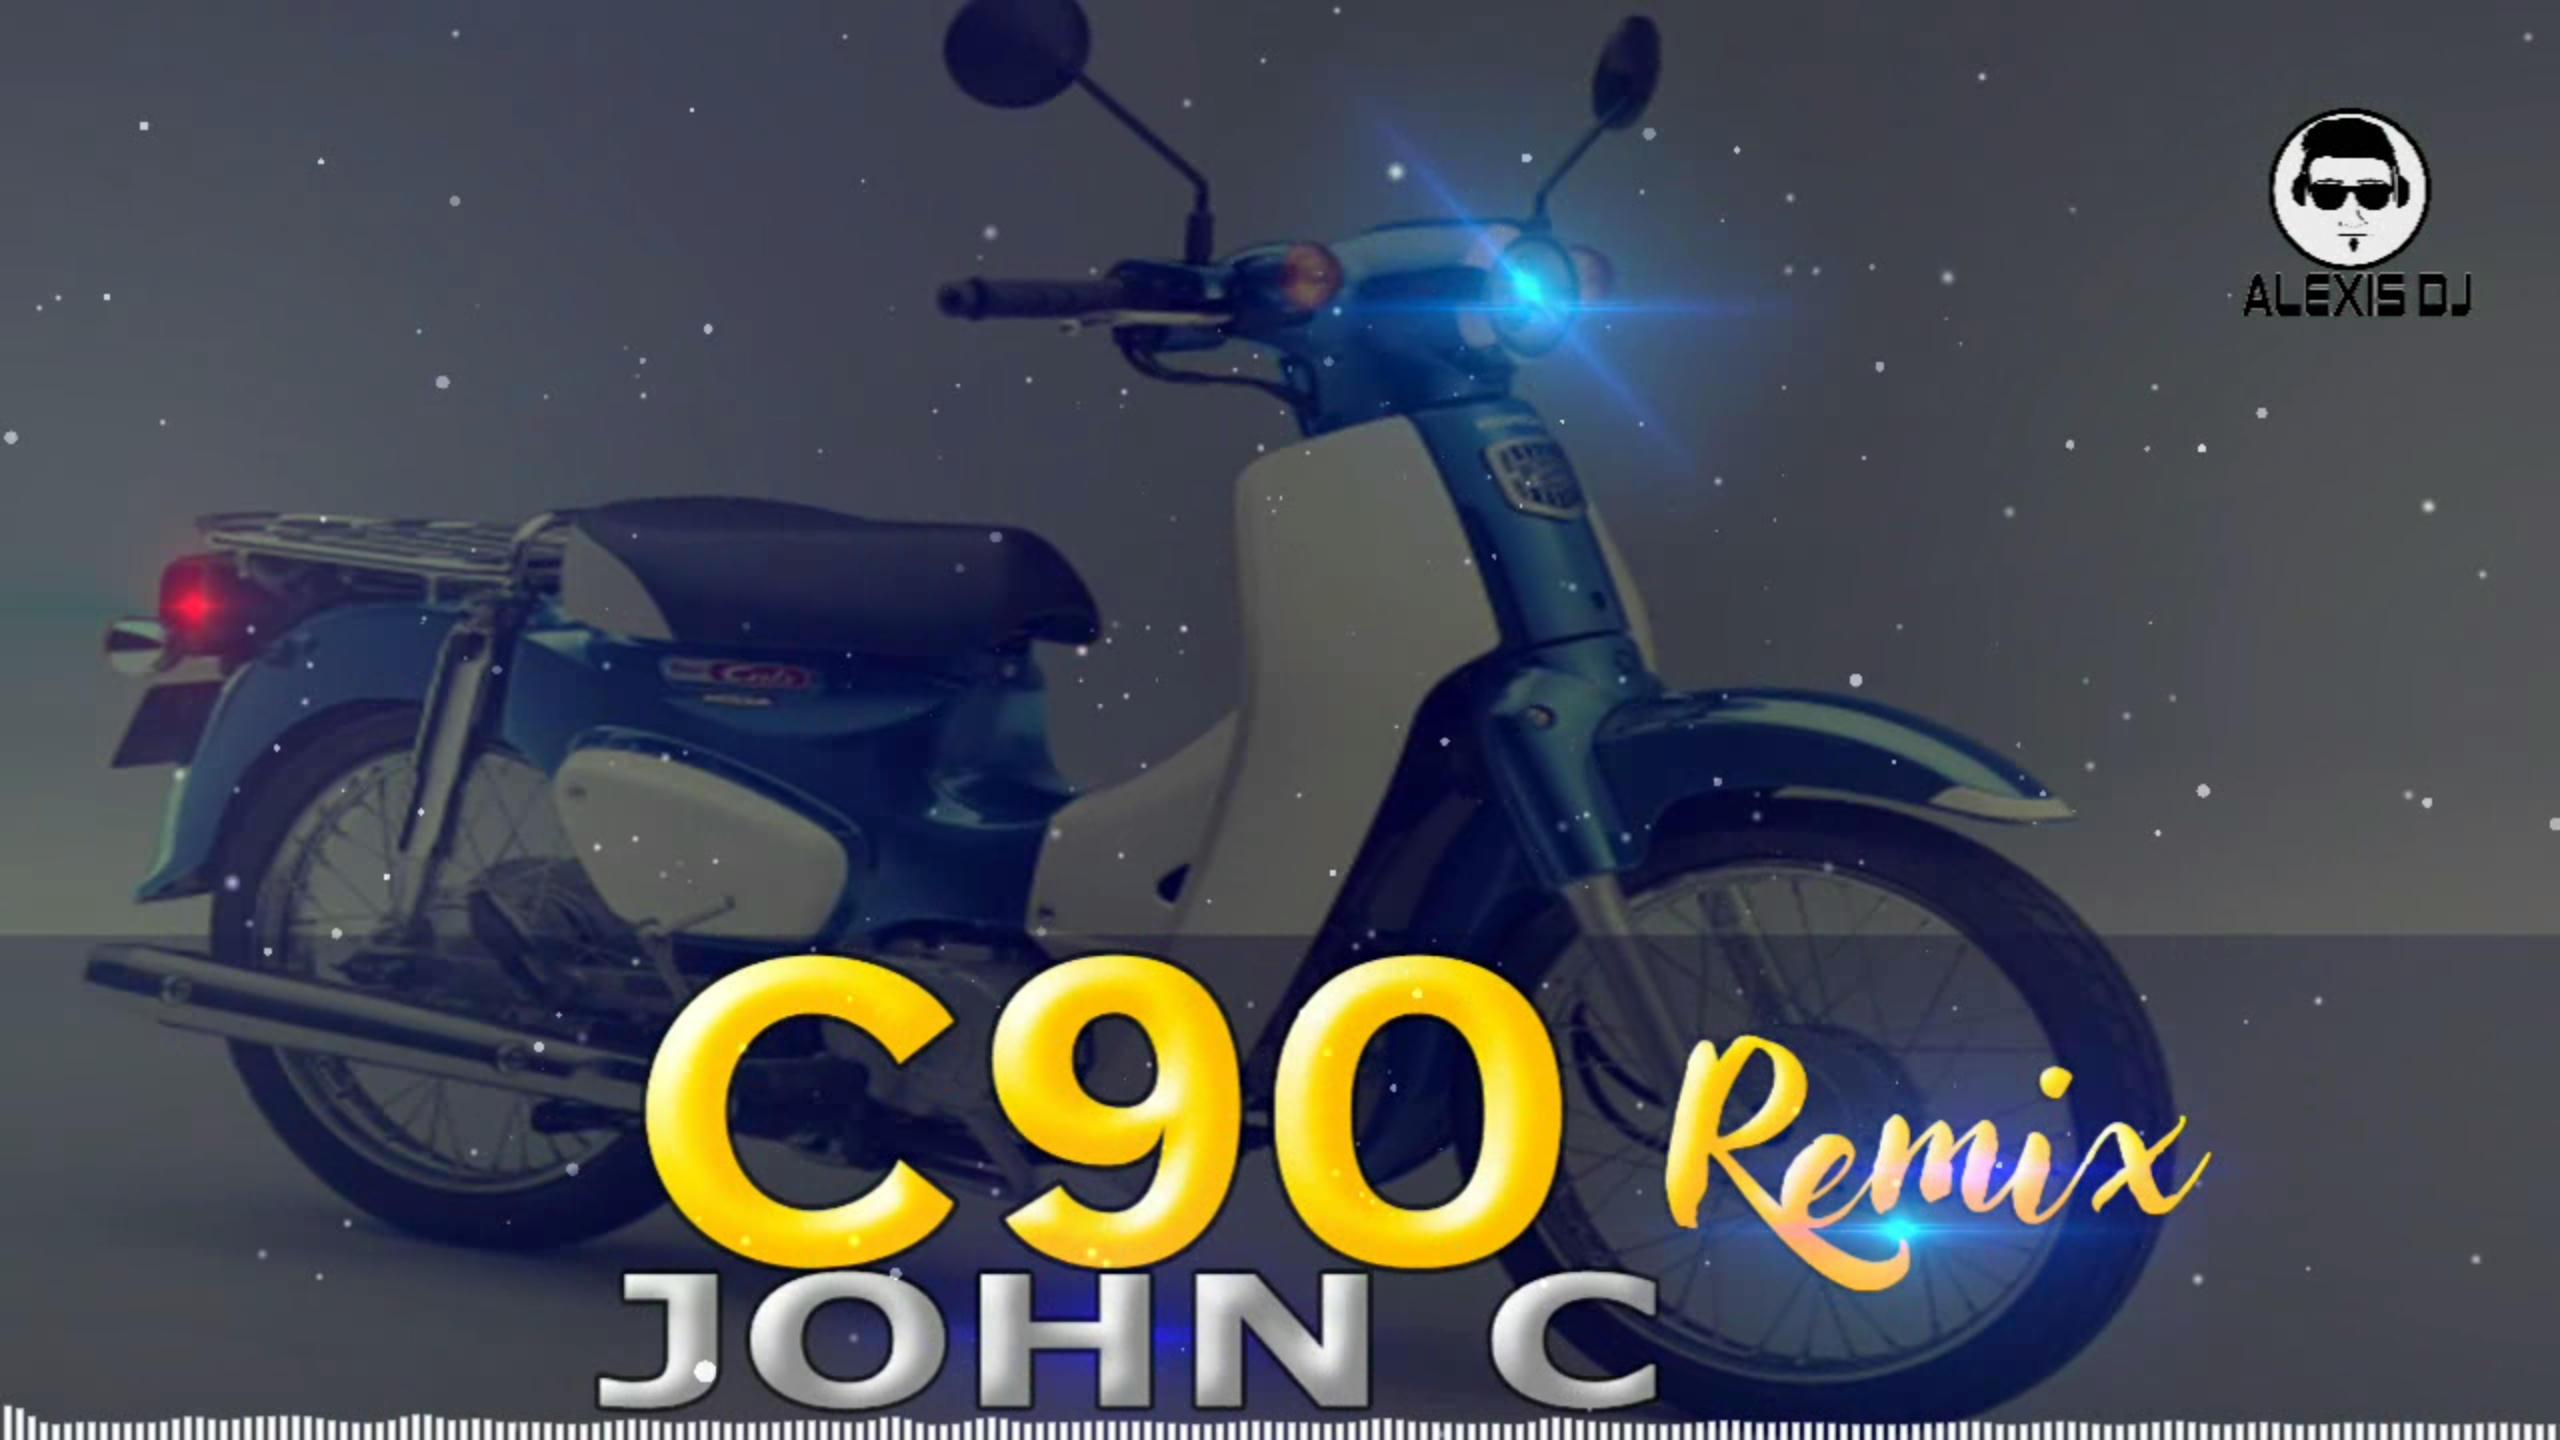 C90 (Remix) - ALEXIS DJ - John C